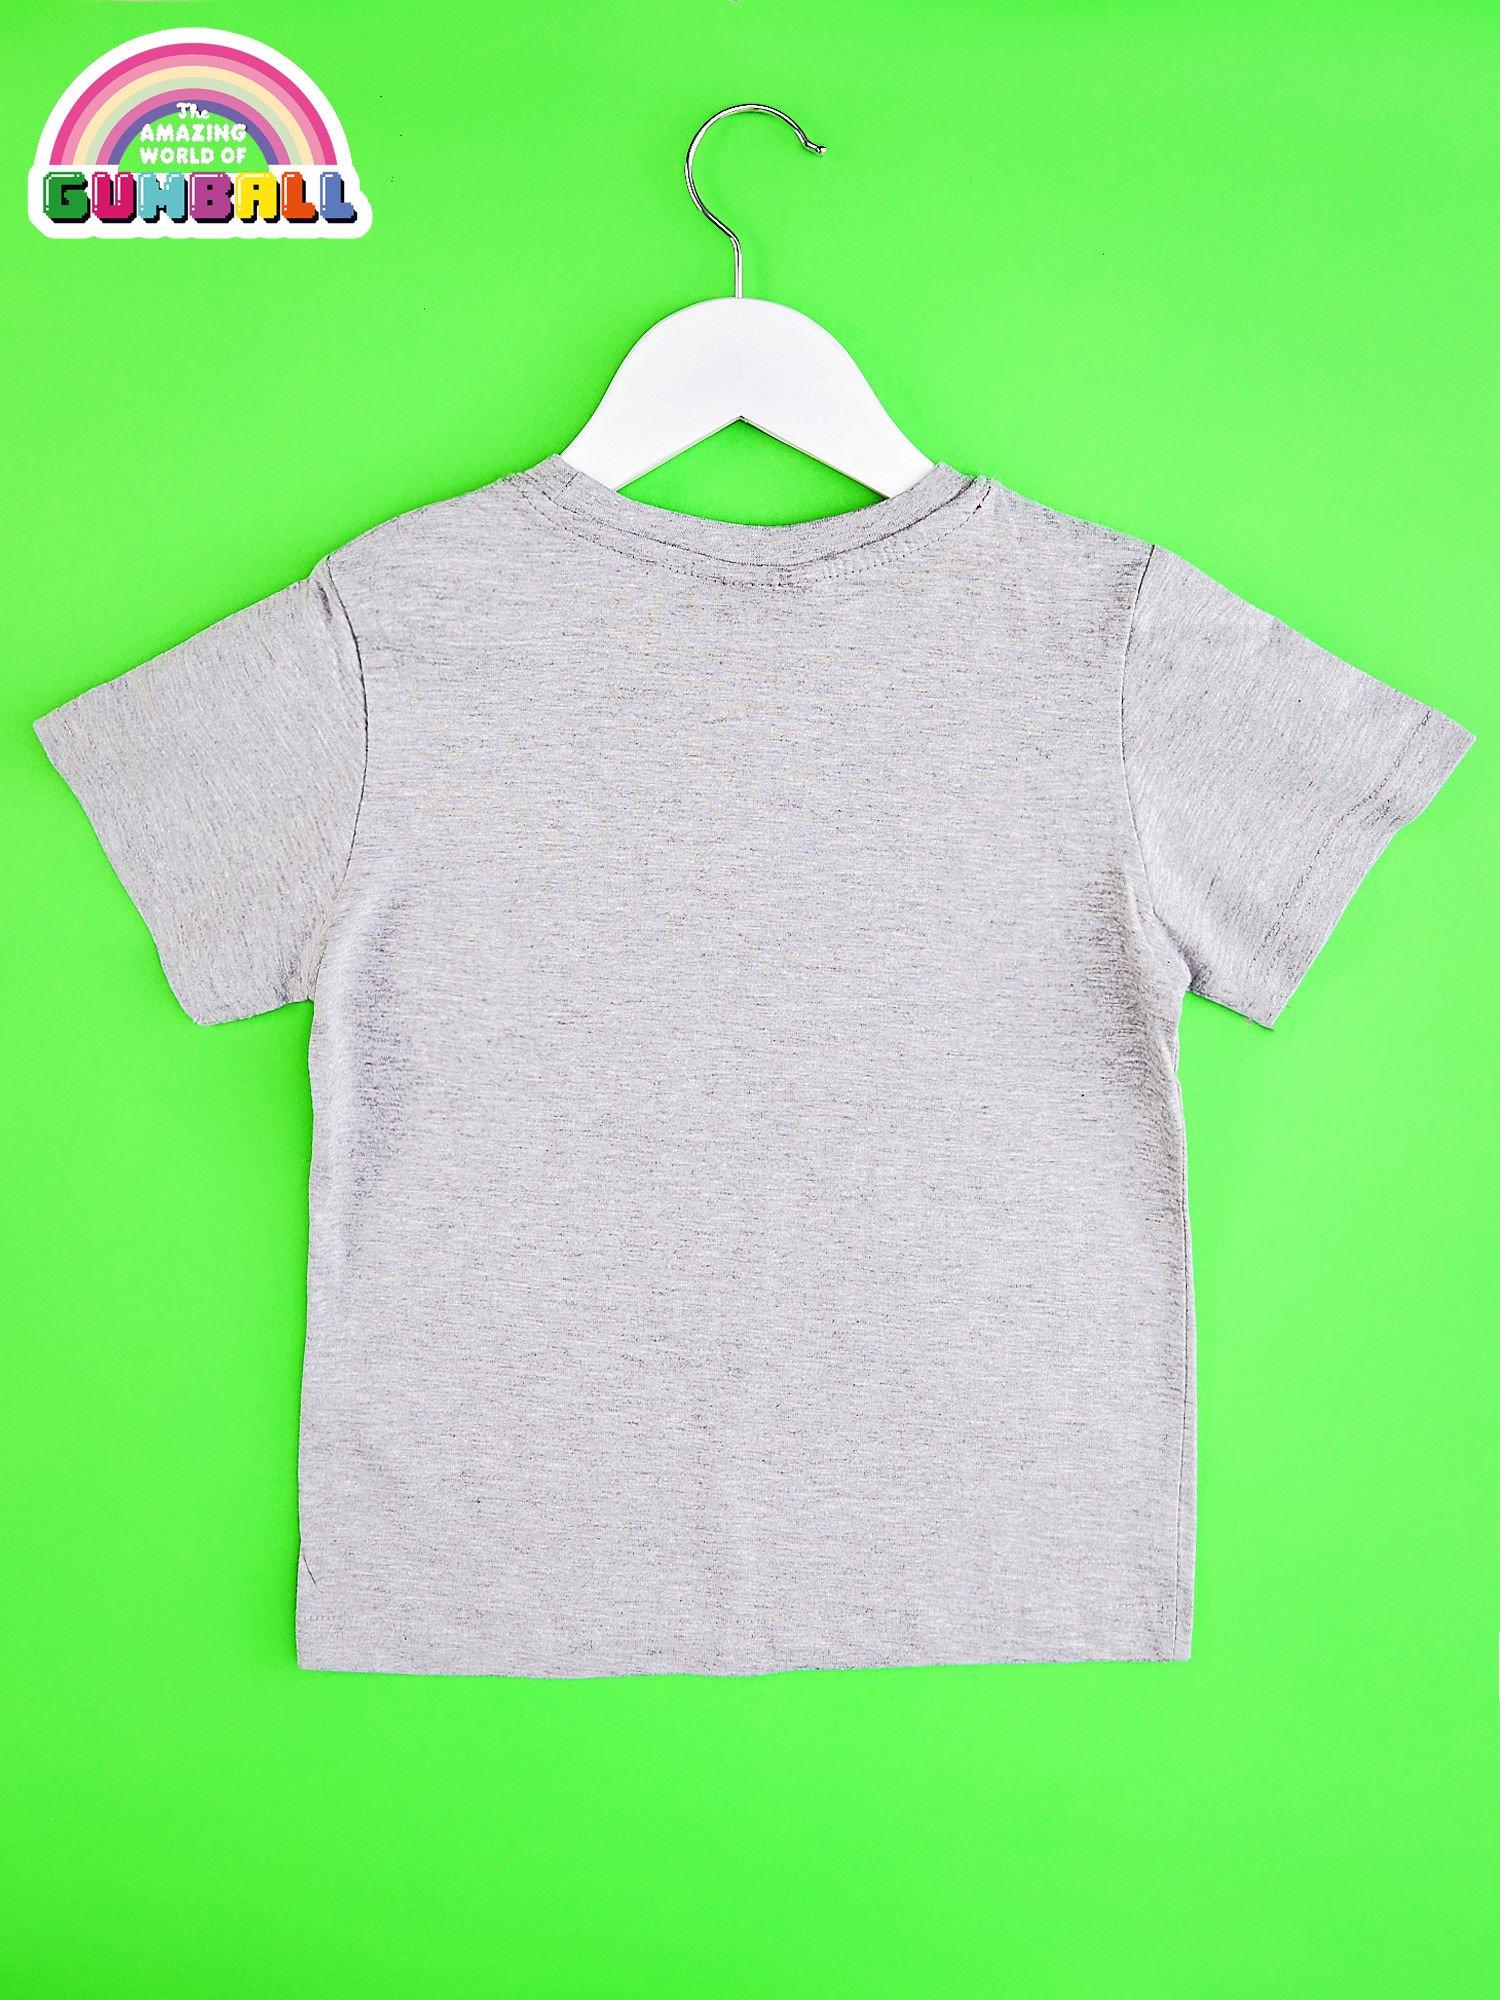 Jasnoszary t-shirt chłopięcy GUMBALL                                  zdj.                                  2